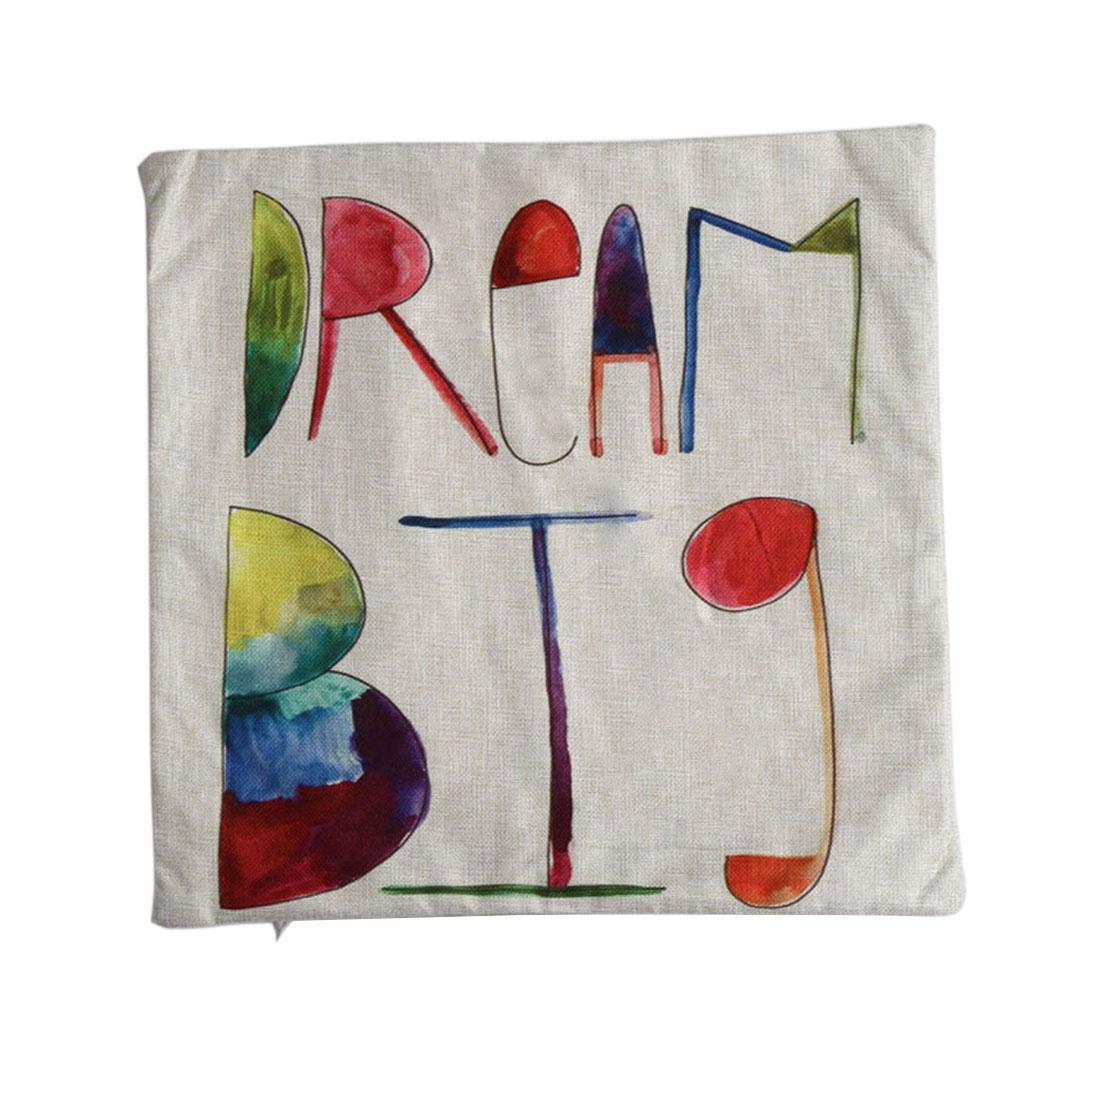 Piccocasa Linen Dream Letters Pattern Pillowcase Cushion Cover 45 x 45cm